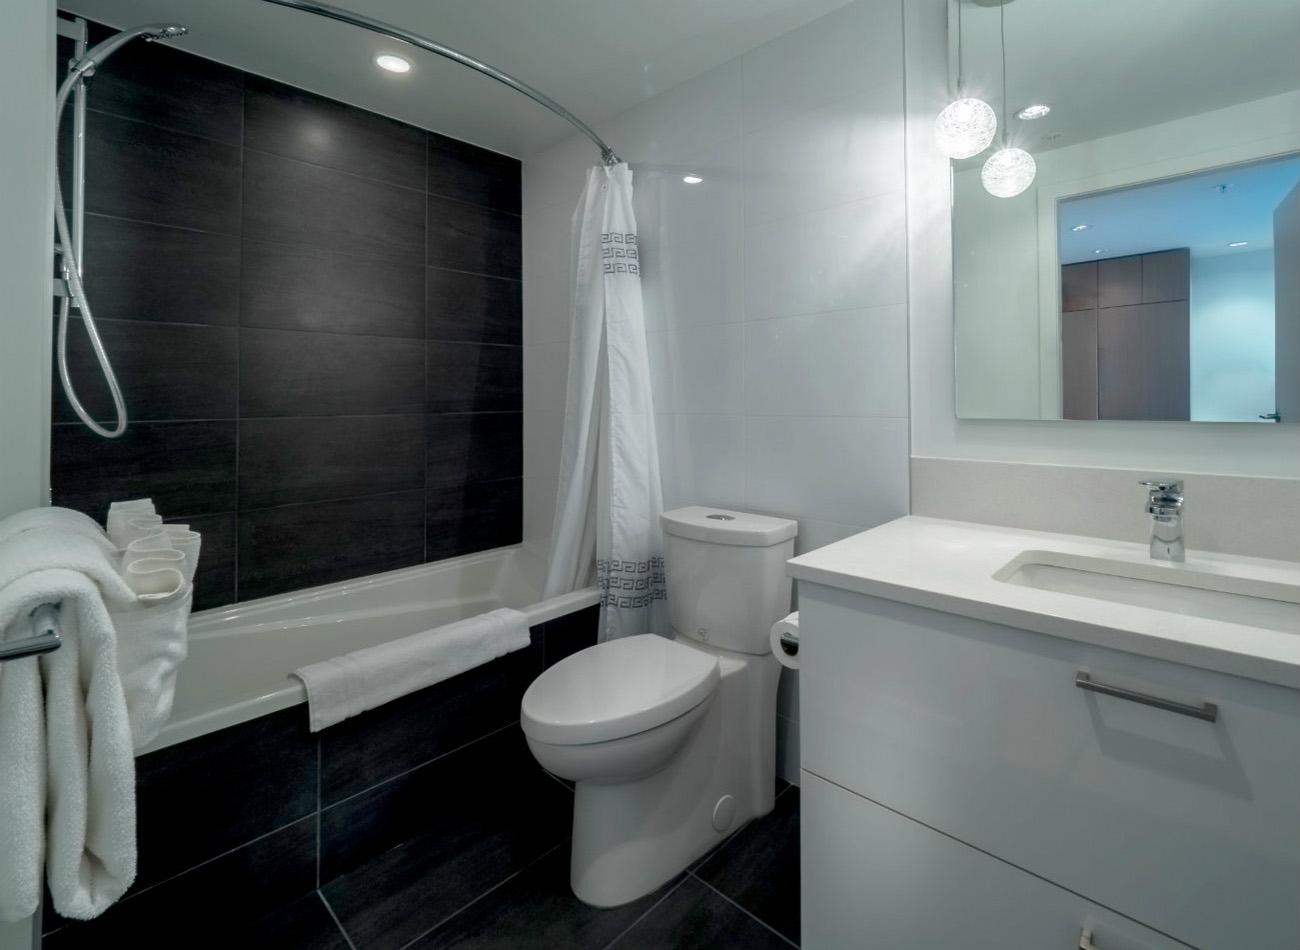 Escher condo bathroom Victoria